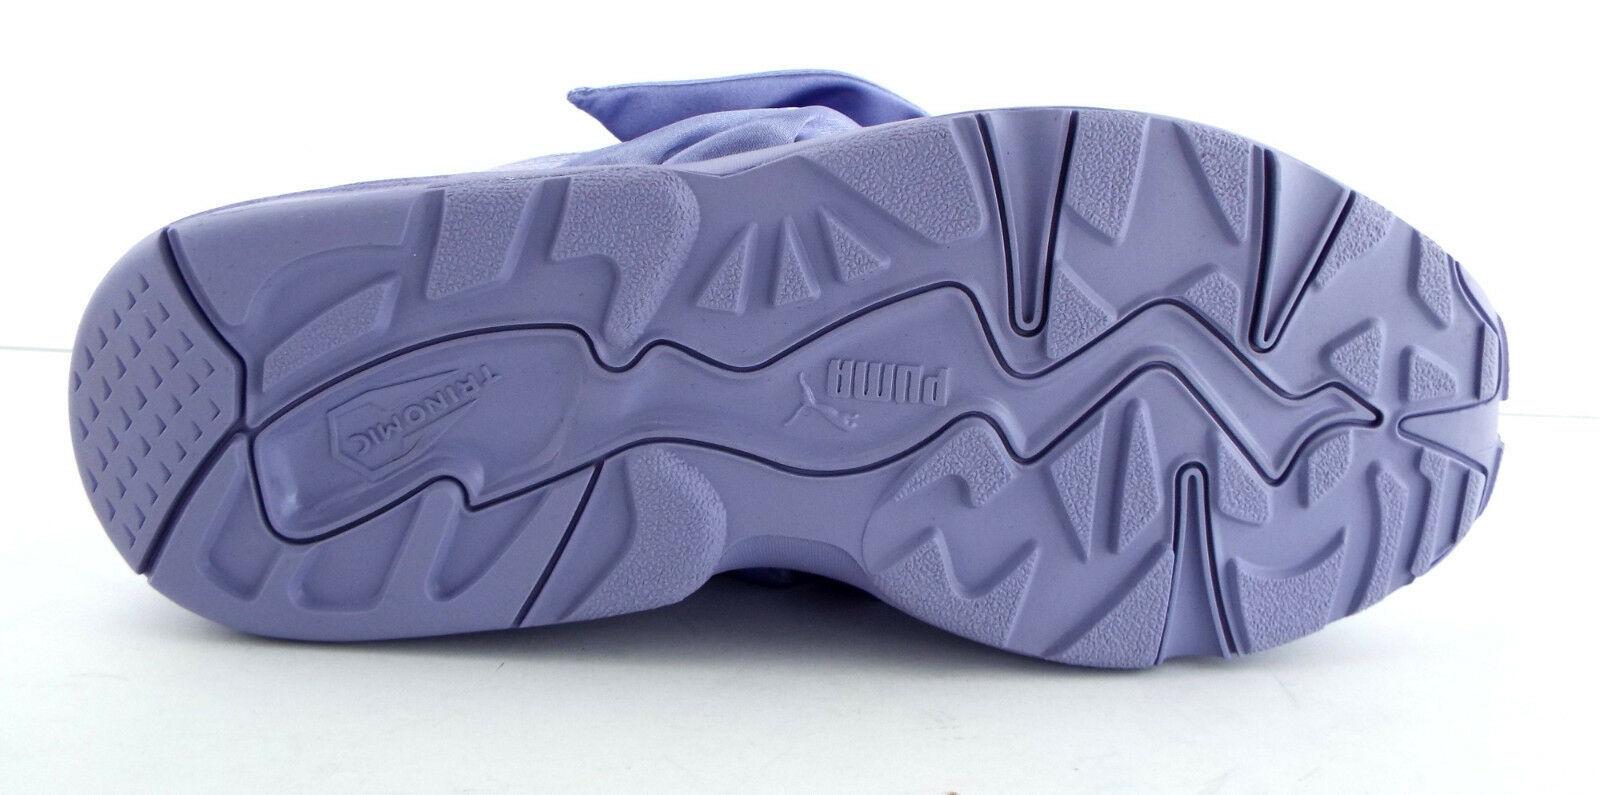 New PUMA RIHANNA Size 9 FENTY Purple Satin Bow Sneakers Shoes image 8